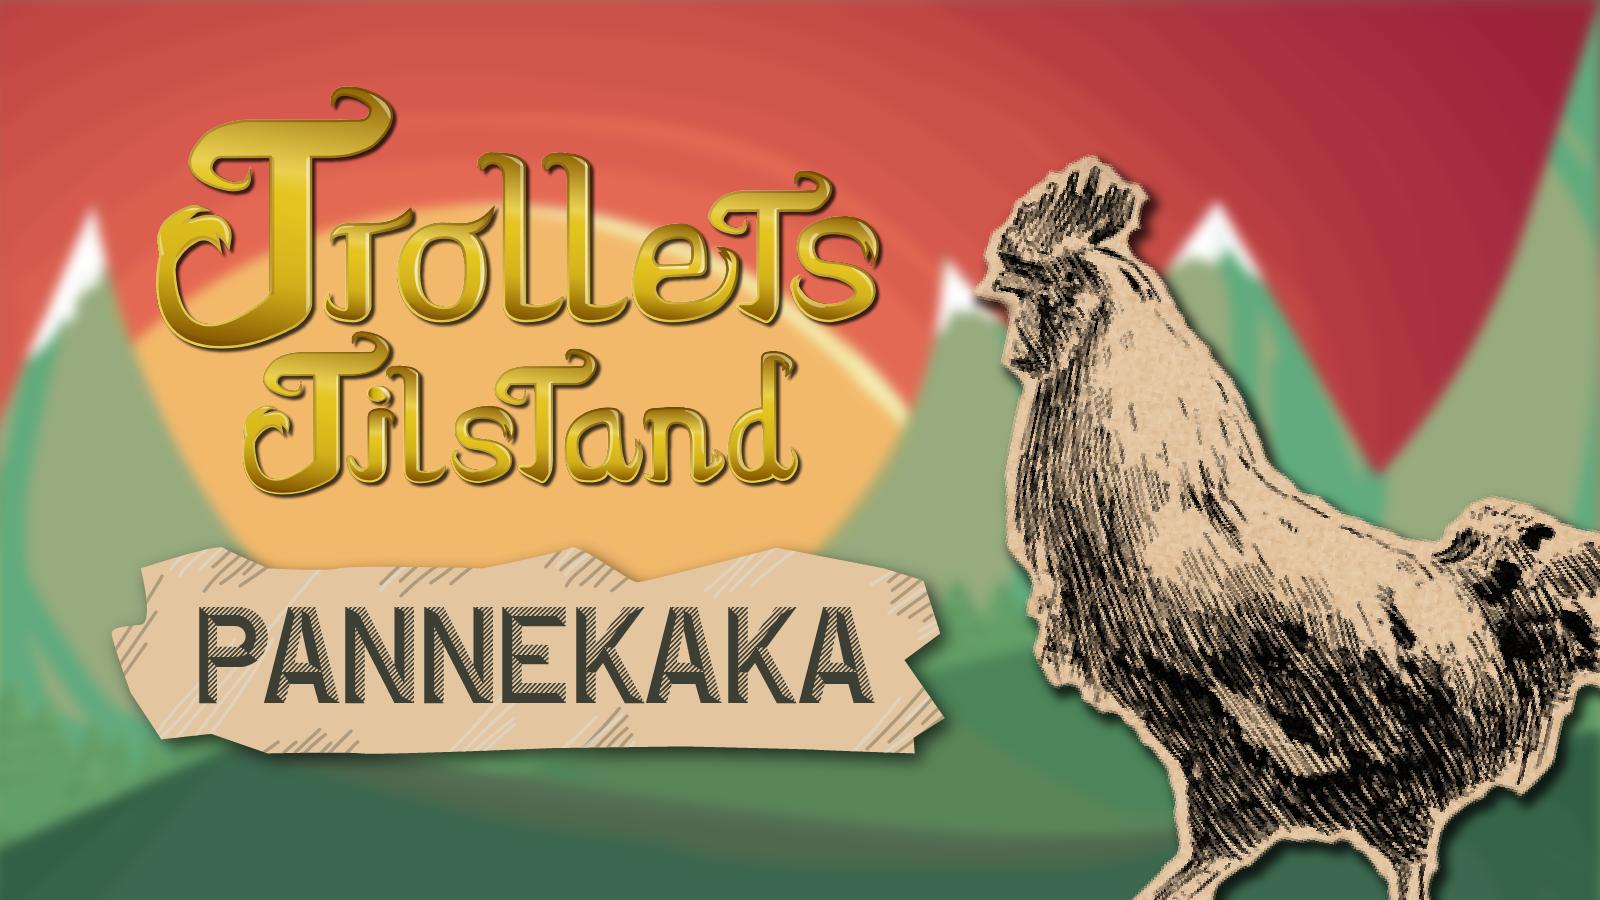 Trollets Tilstand: Pannekaka